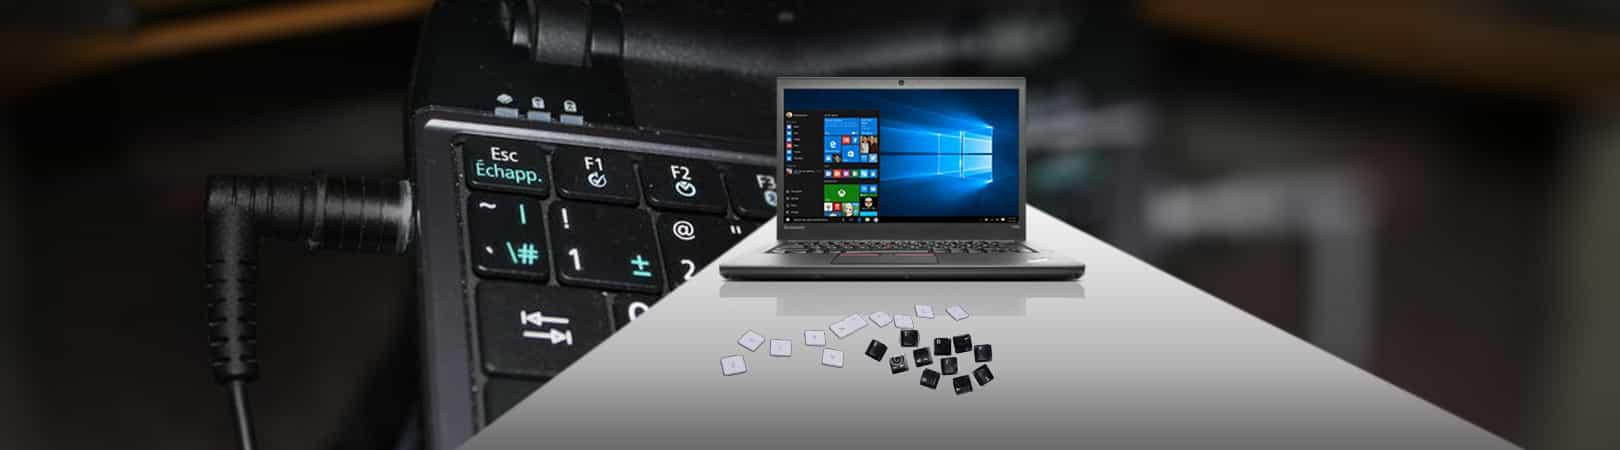 banner image - Samsung Laptop Keyboard Replacement